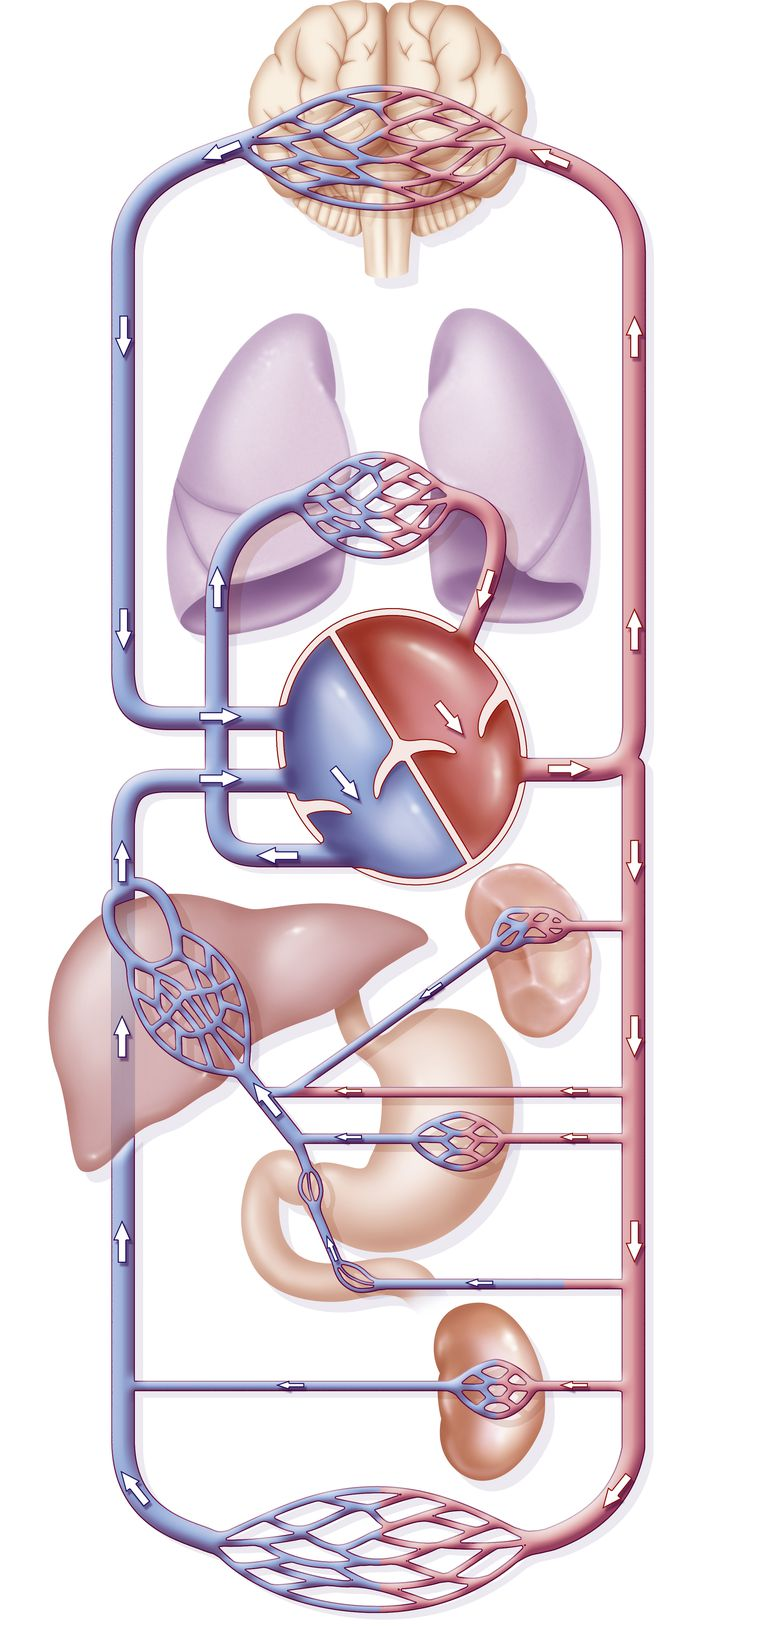 Circuito Sanguineo : Sistema circulatorio pulmonar